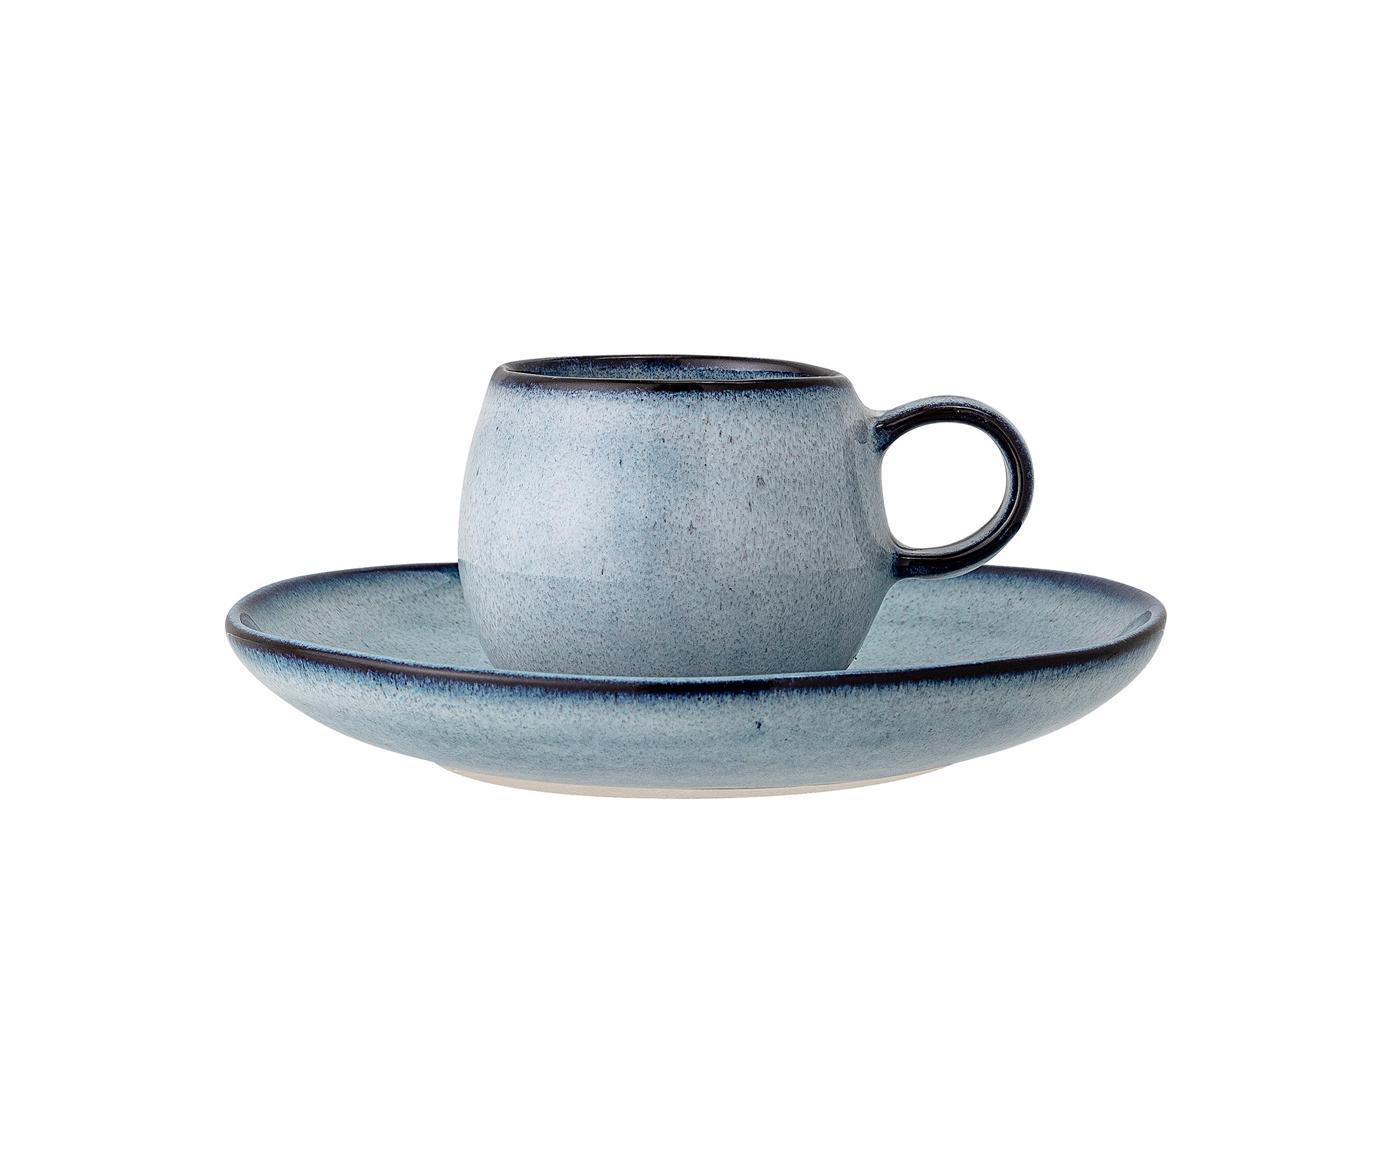 Taza de café artesanal con platito Sandrine, Gres, Tonos azules, Ø 7 x Al 6 cm